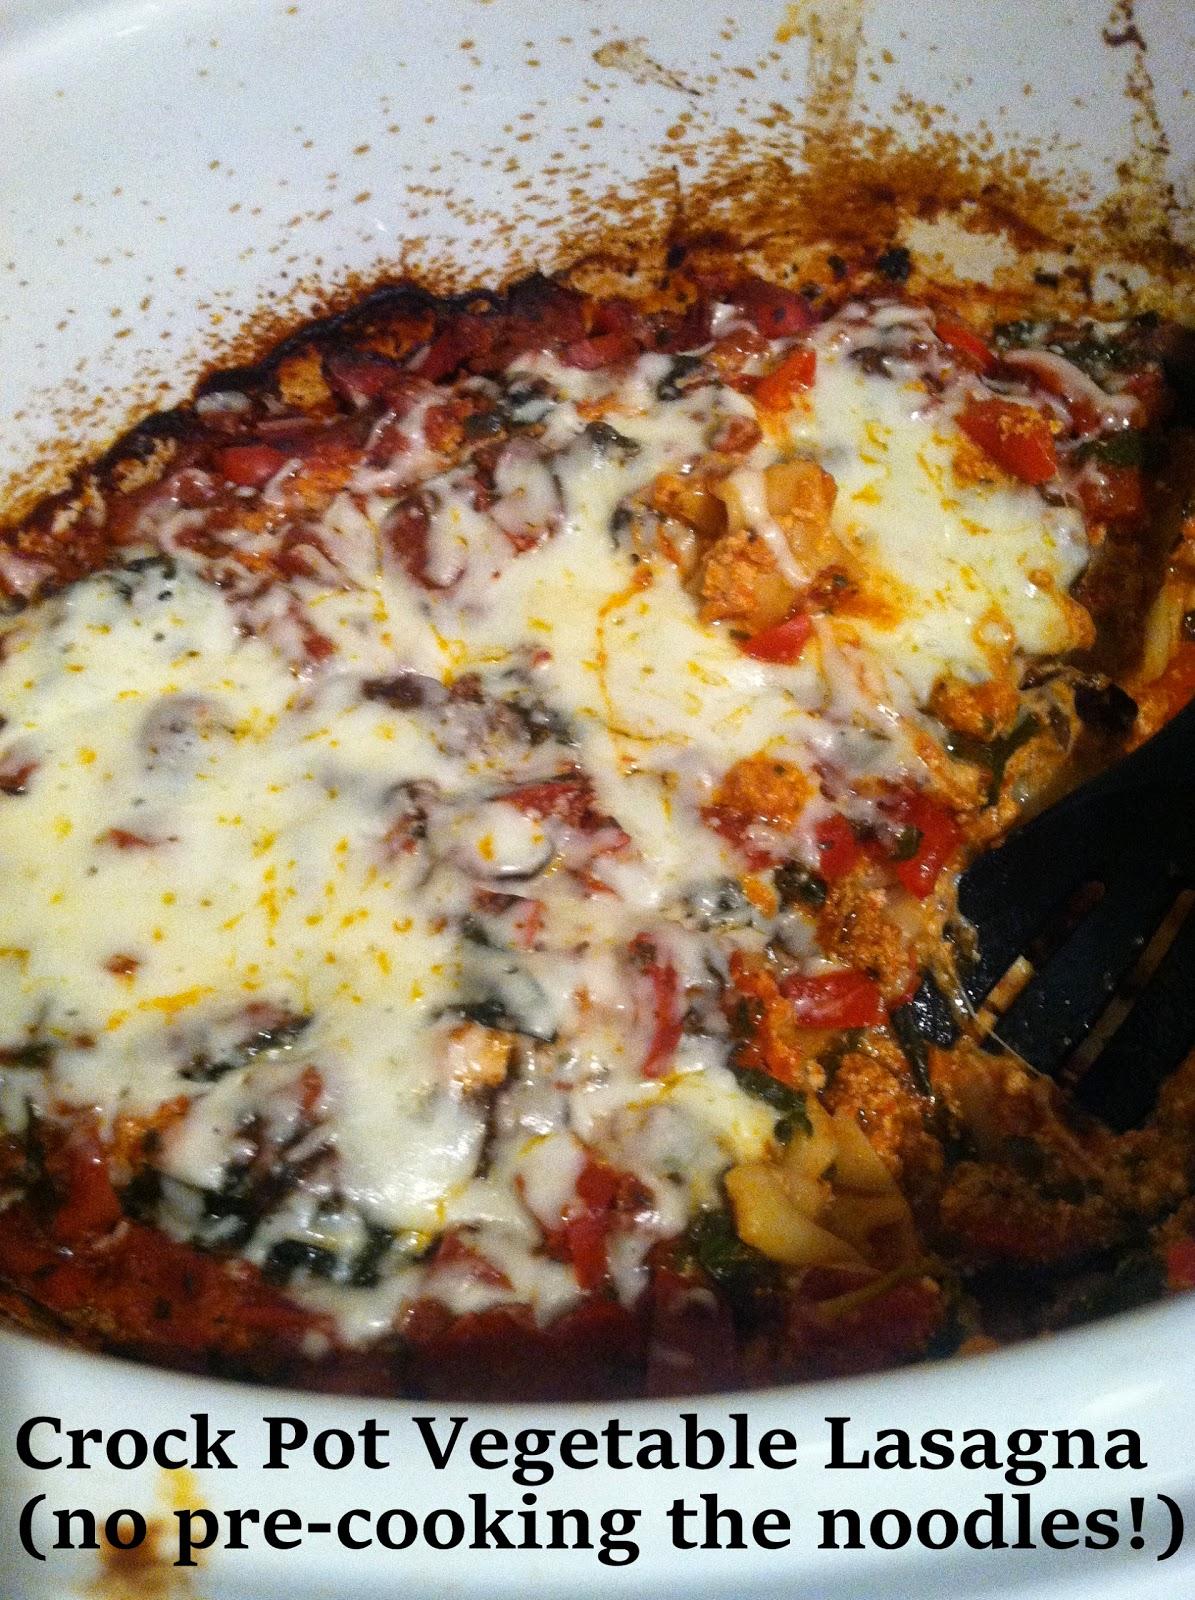 Crock Pot Vegetable Lasagna - LaForce Be With You